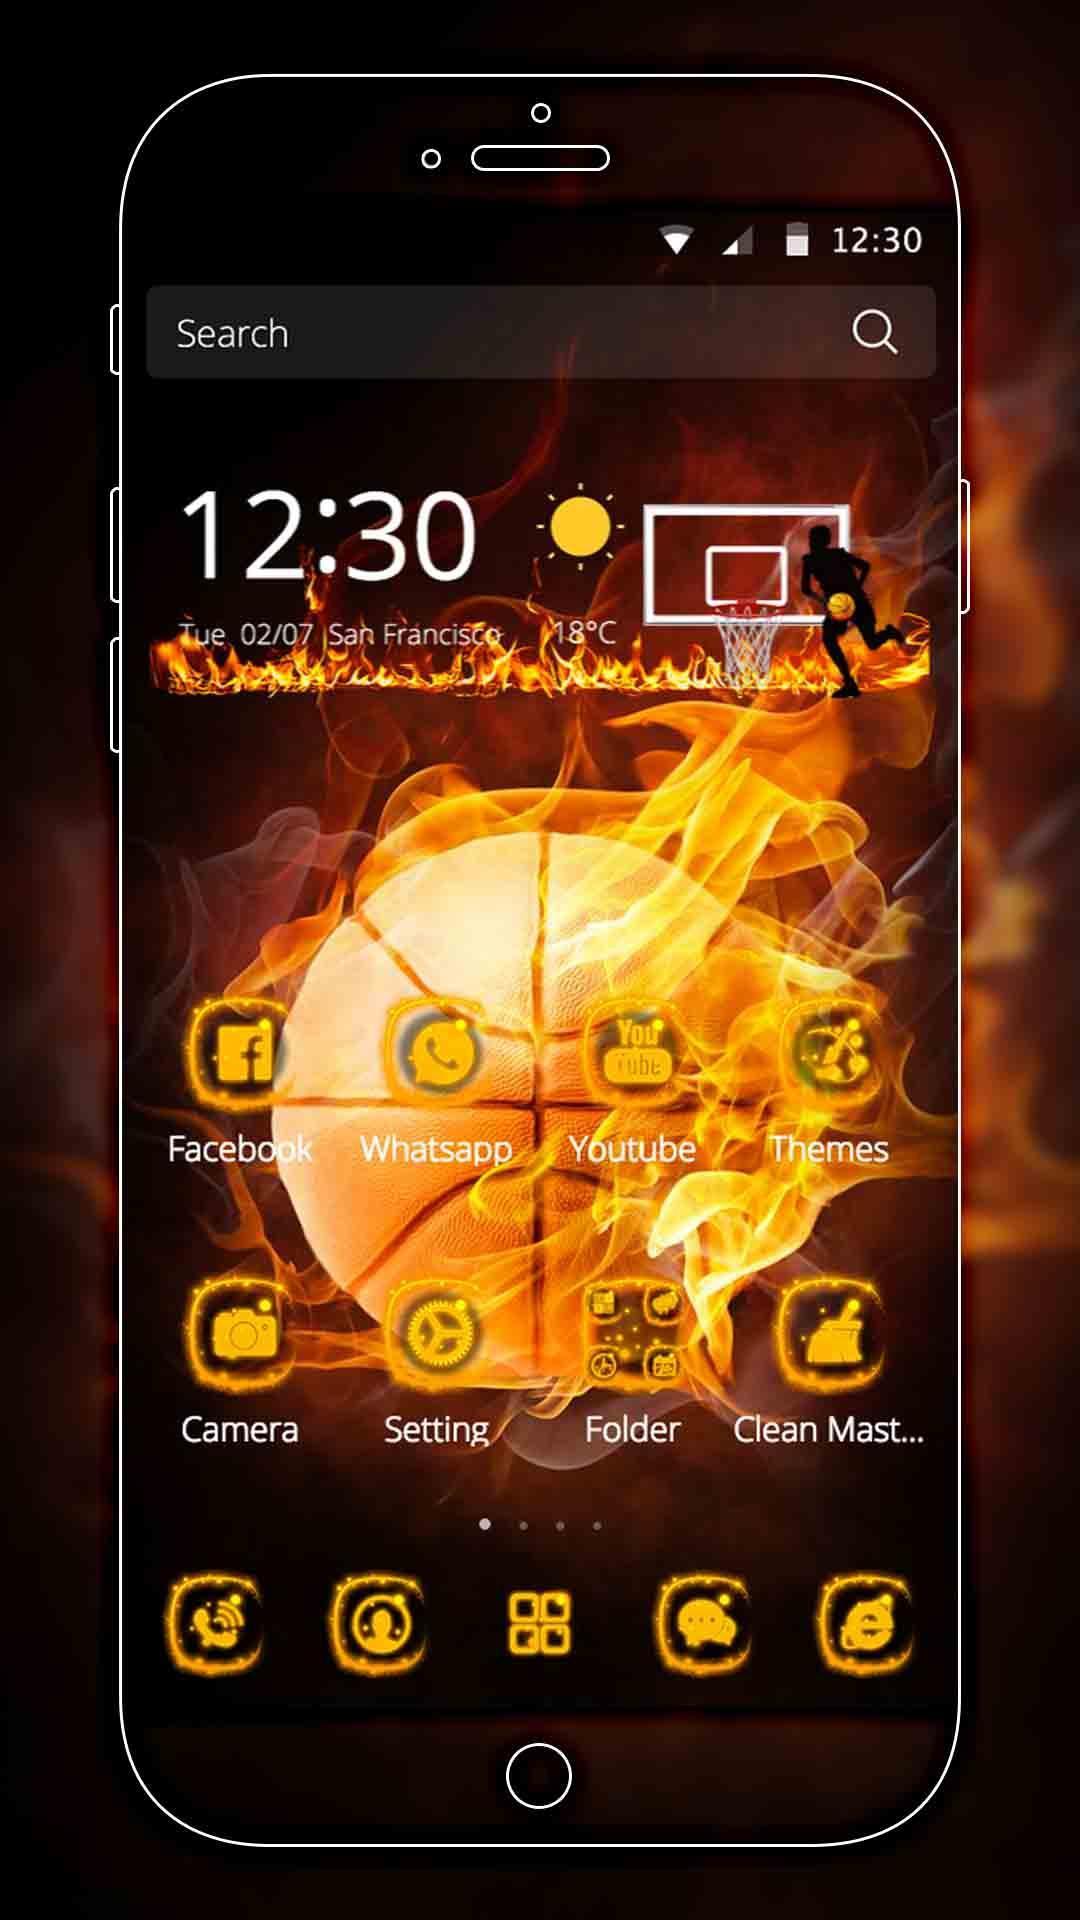 Android 用の クールバスケットボールファイヤーボールのテーマダーク